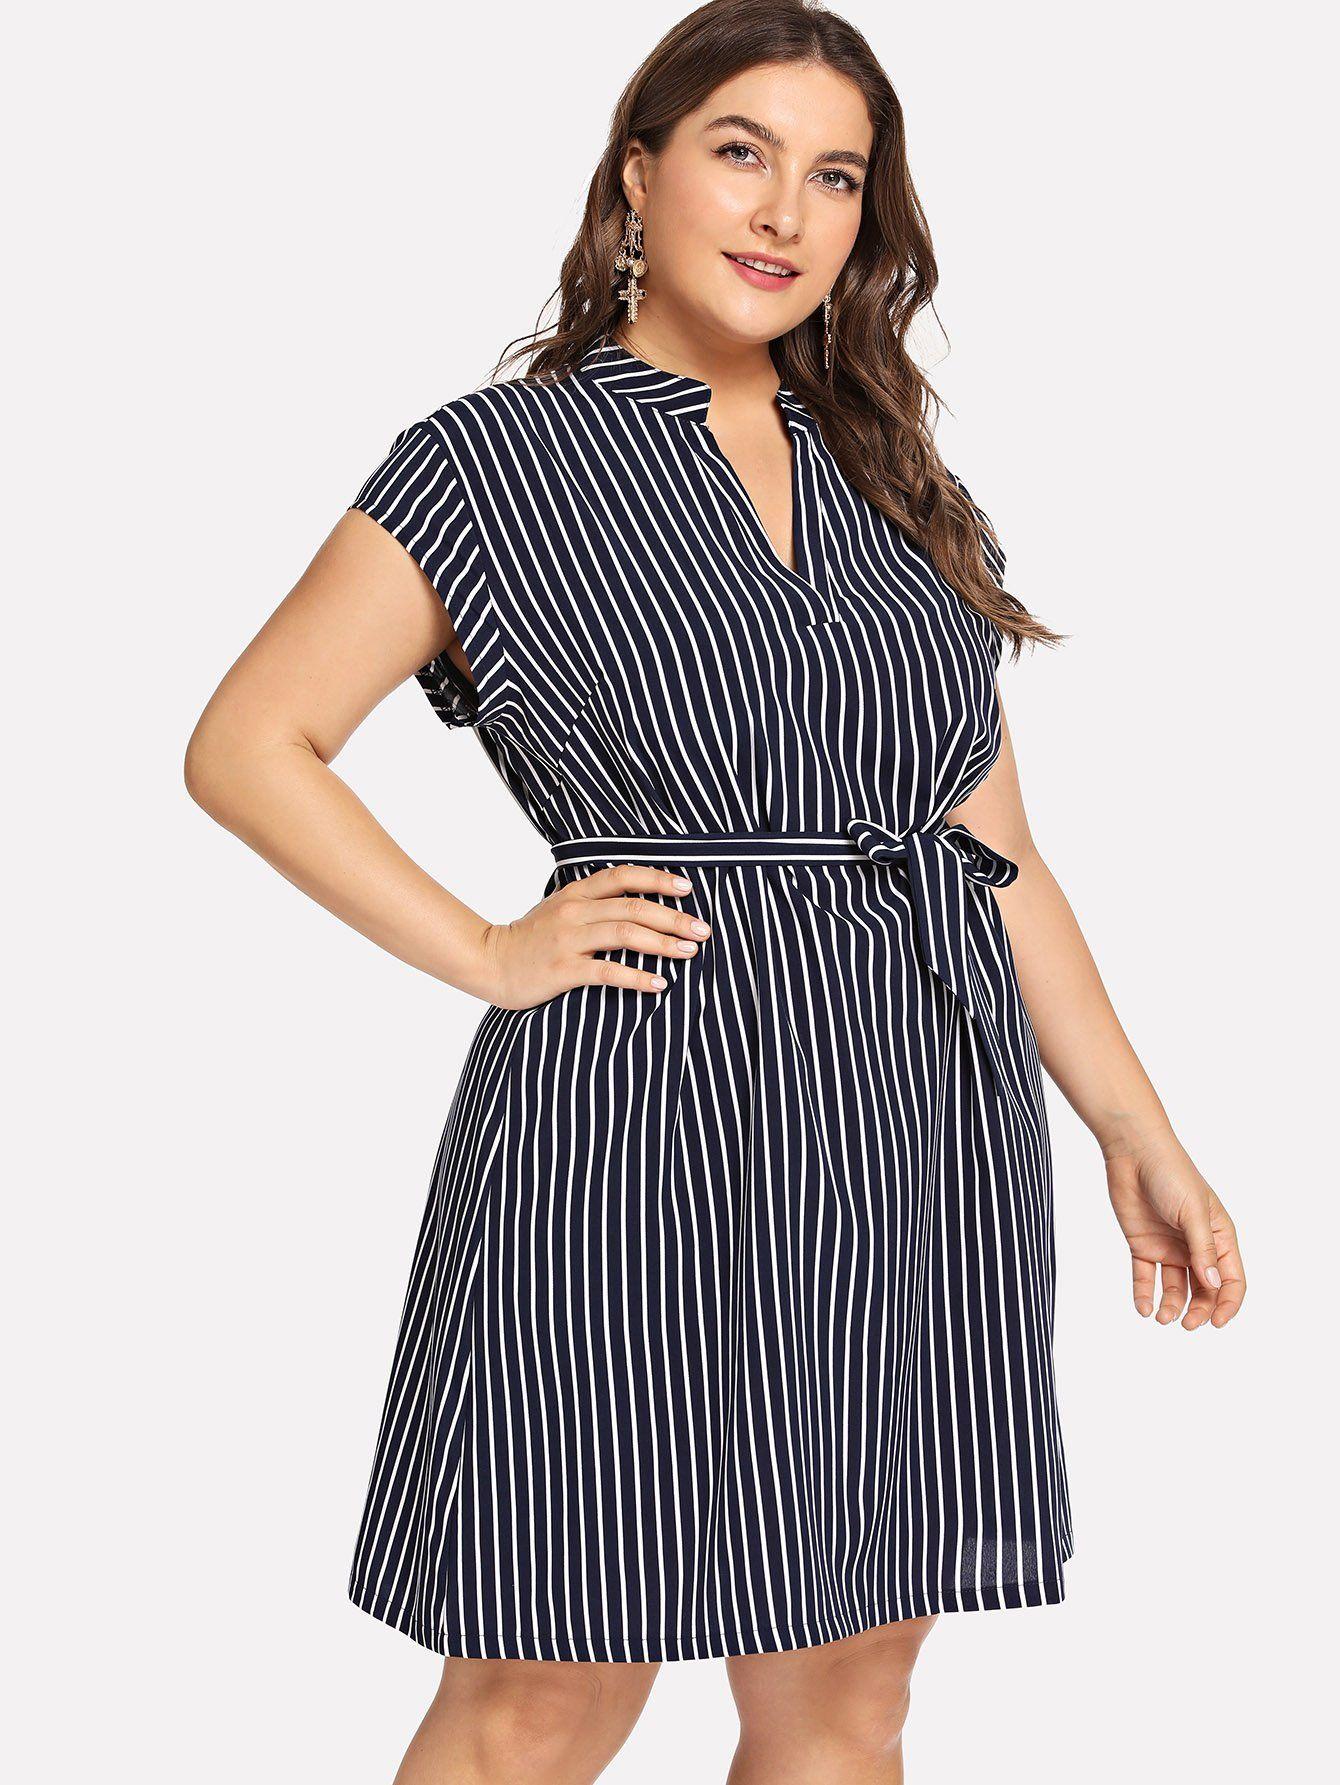 9a91f5a058 plus v neck striped dress.  fashion  plus size  plus size dresses ...